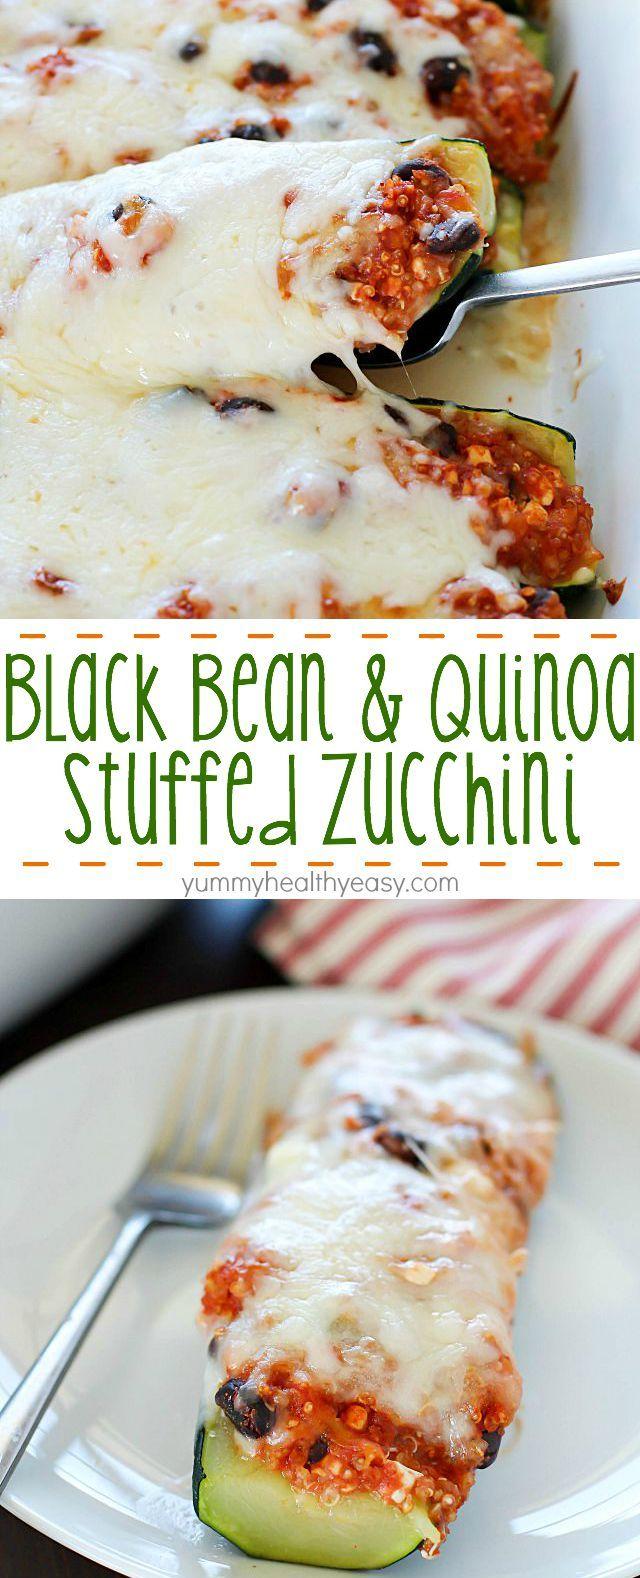 Black Bean & Quinoa Stuffed Zucchini